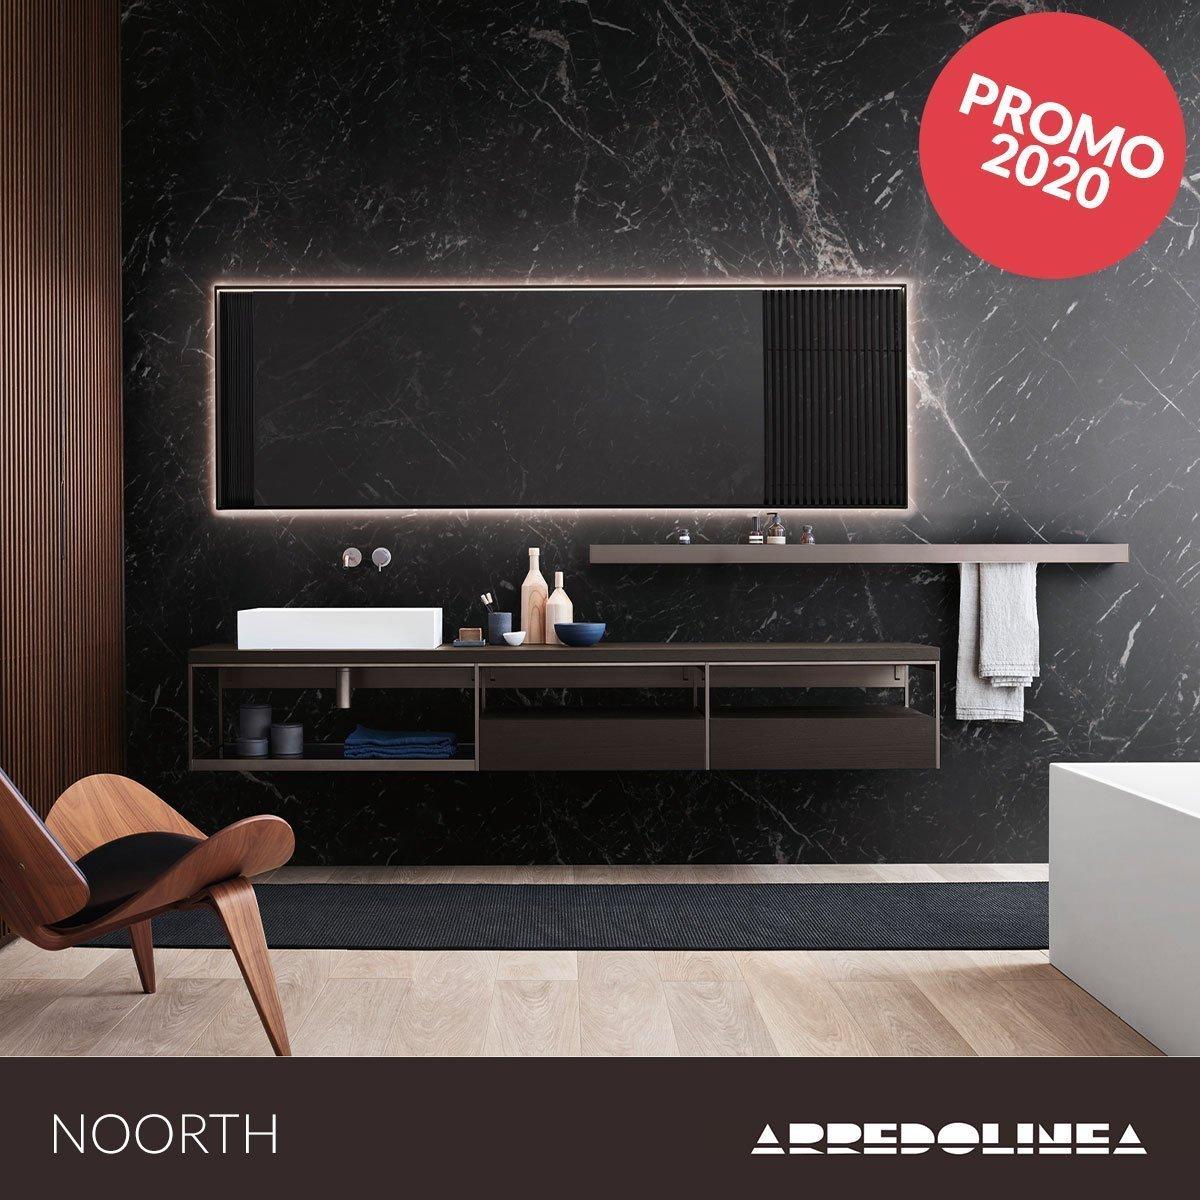 Promo 2020 - Noorth